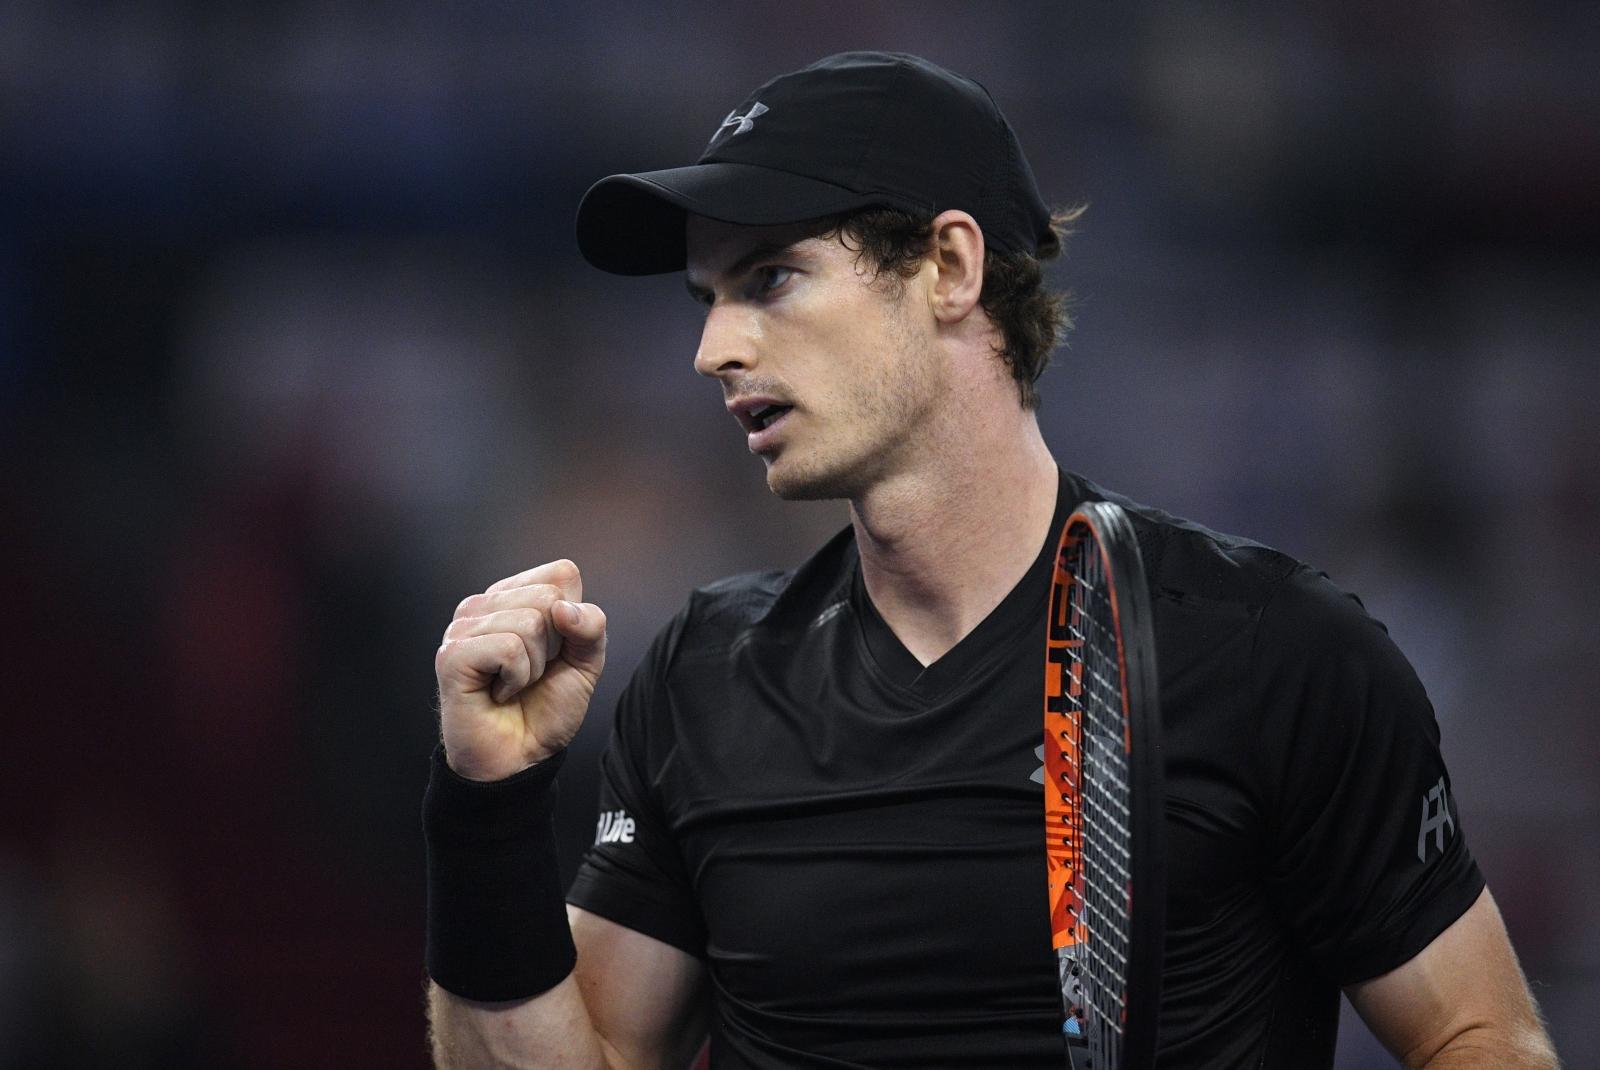 Shanghai Masters 2016 Andy Murray Dominates Steve Johnson